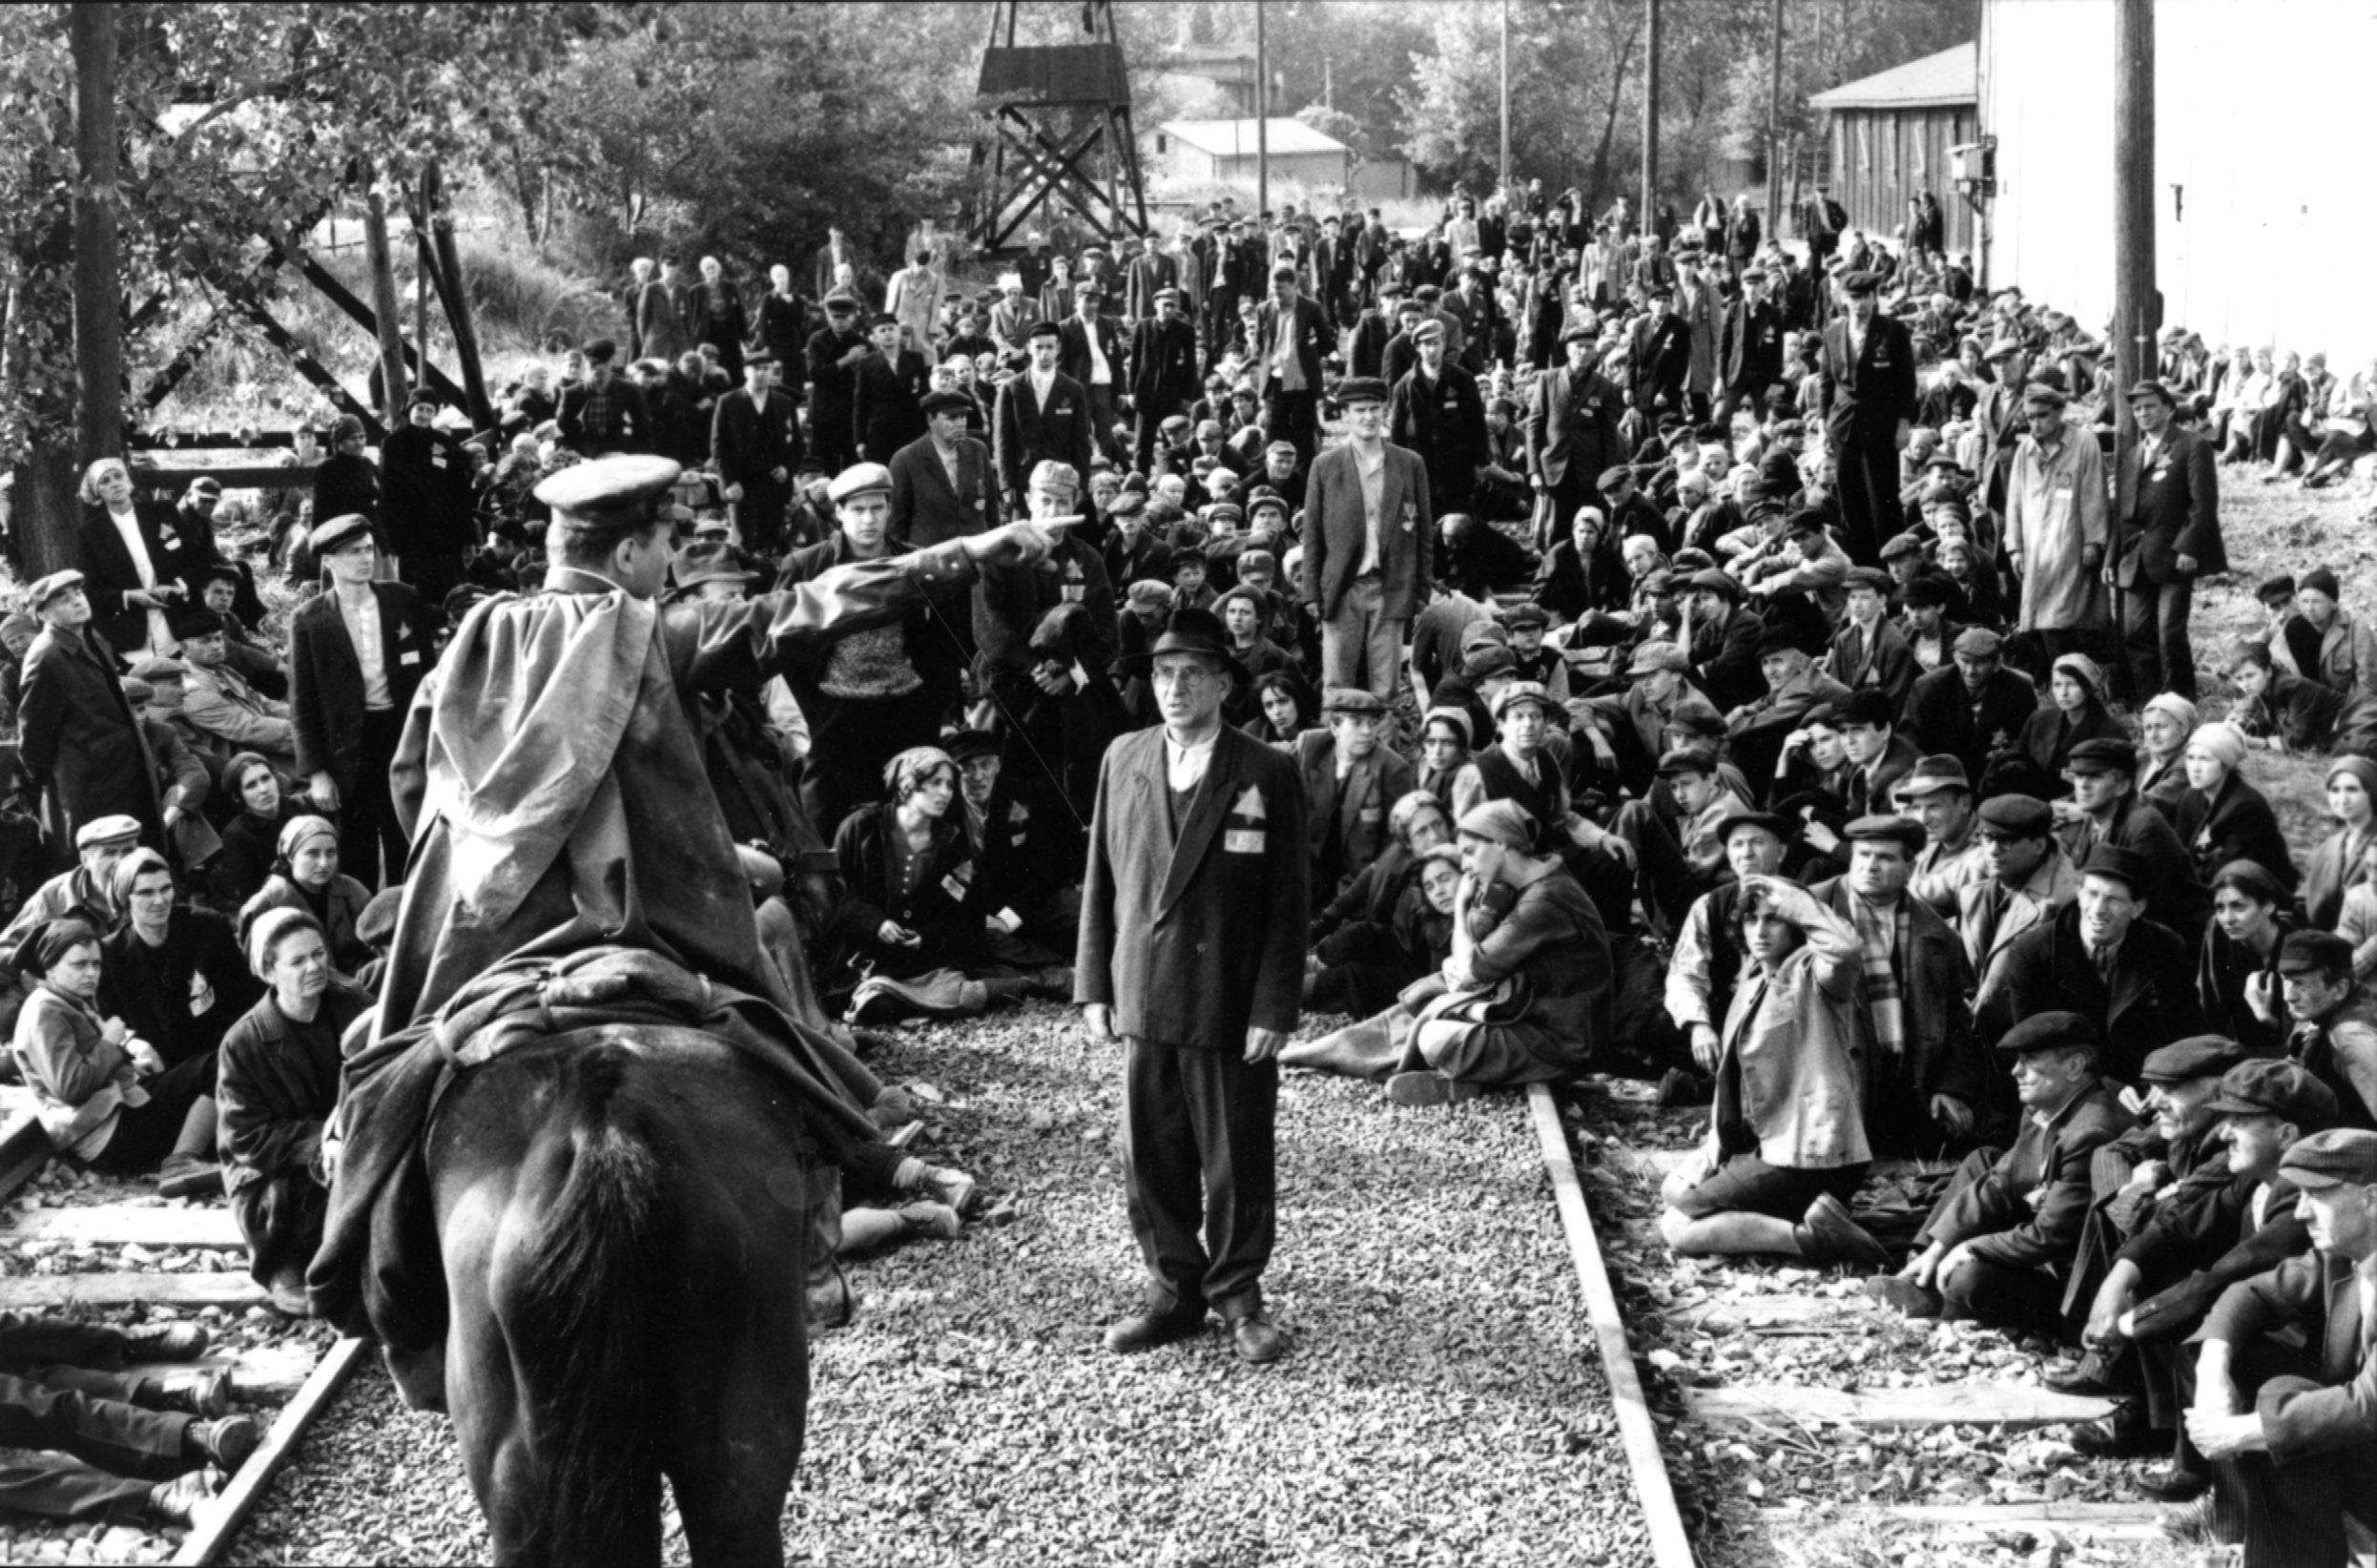 Schindler S List Still The Definitive Holocaust Drama The Boston Globe